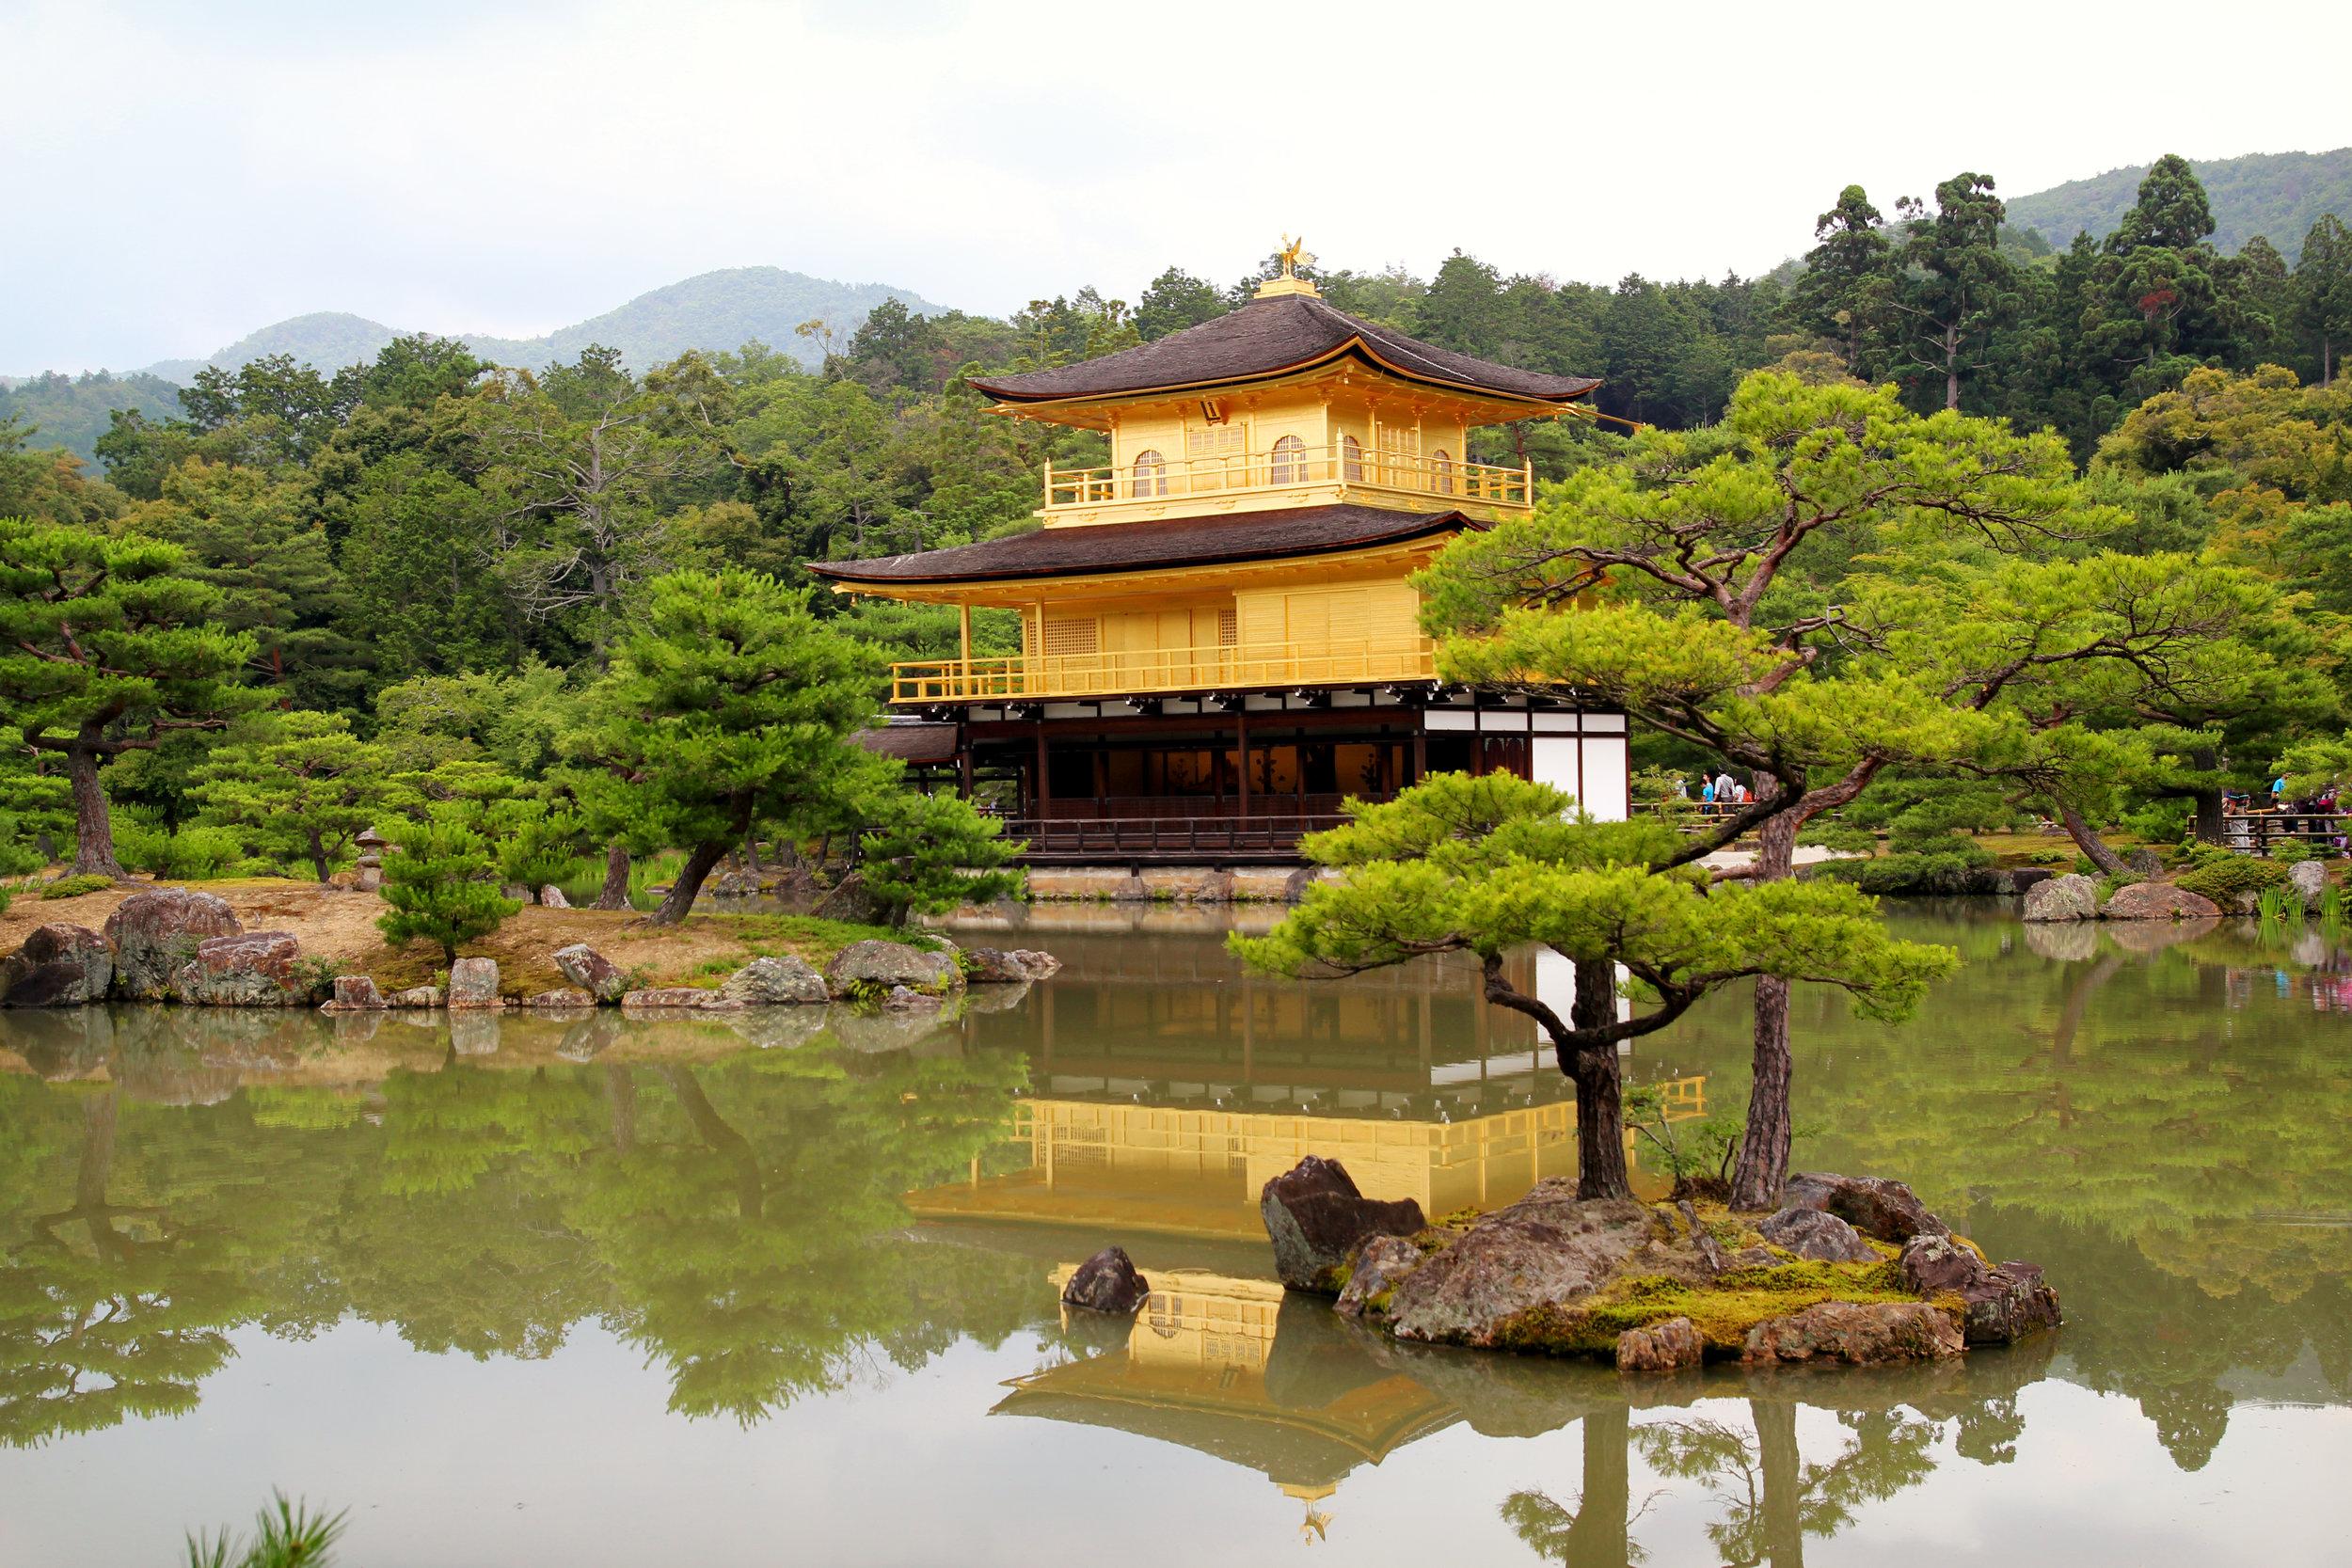 Temple of the Golden Pavilion | Kyoto, Japan